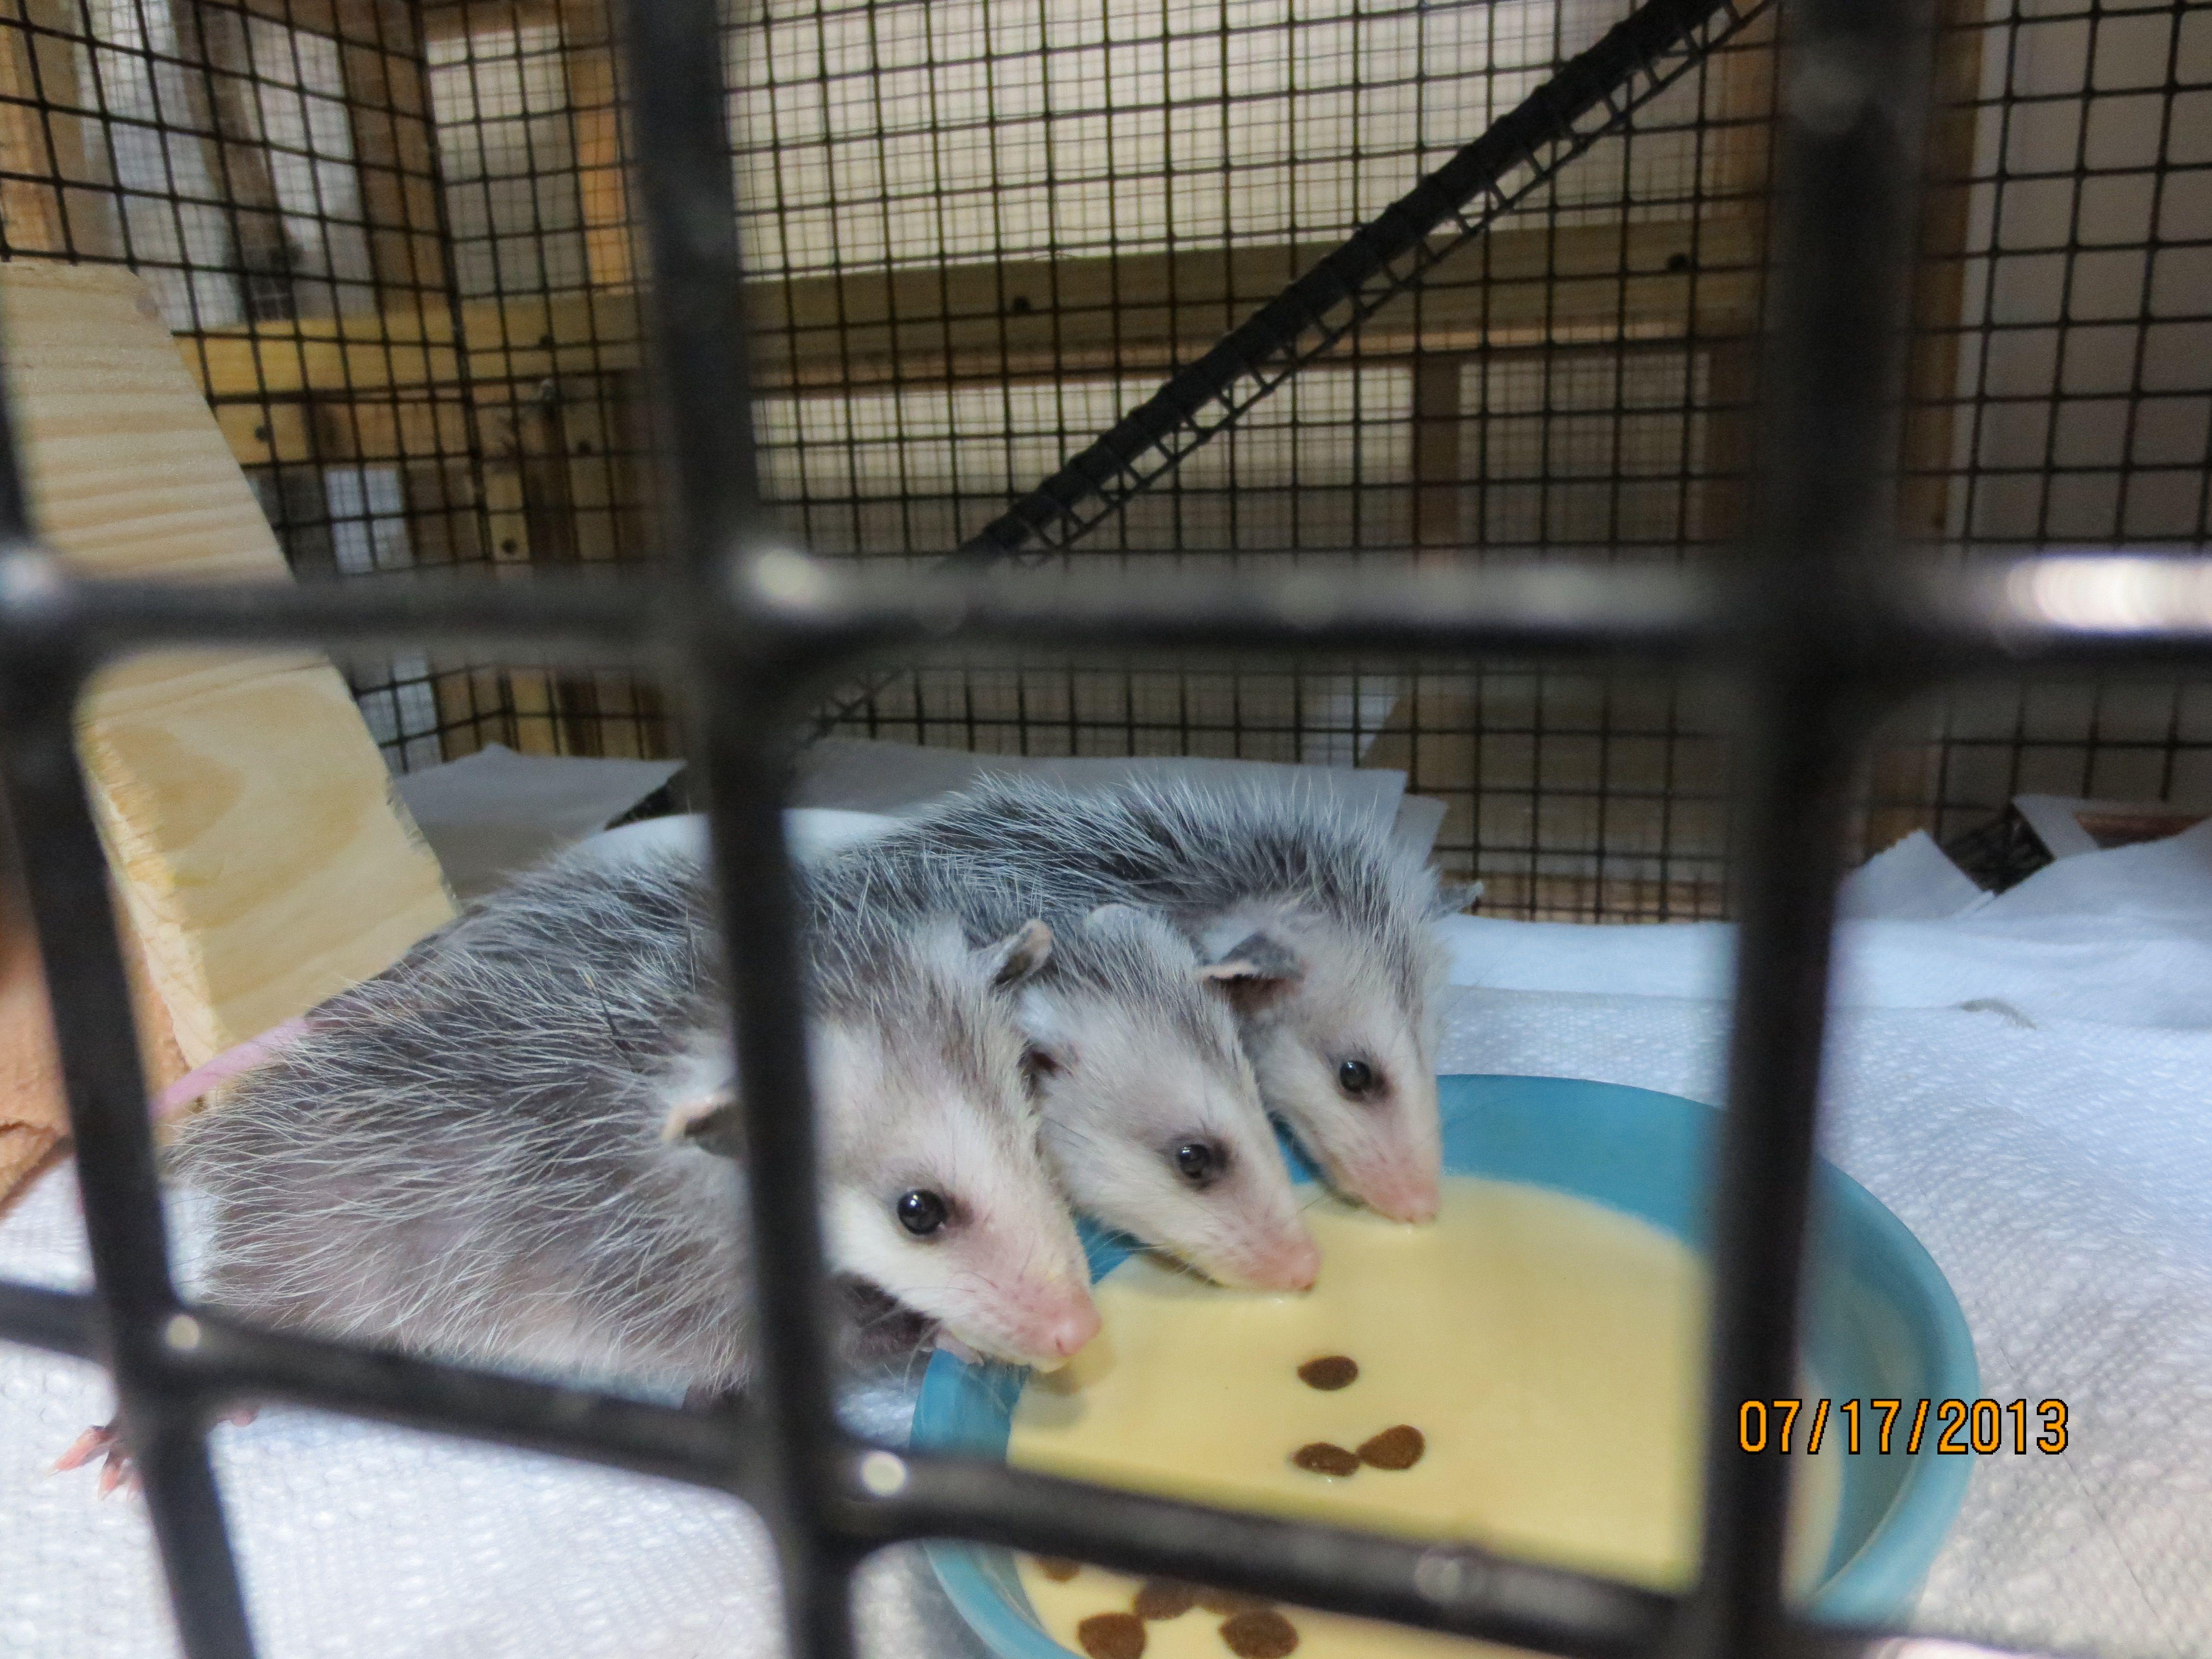 3 orphaned baby opossums Baby opossum, Wildlife